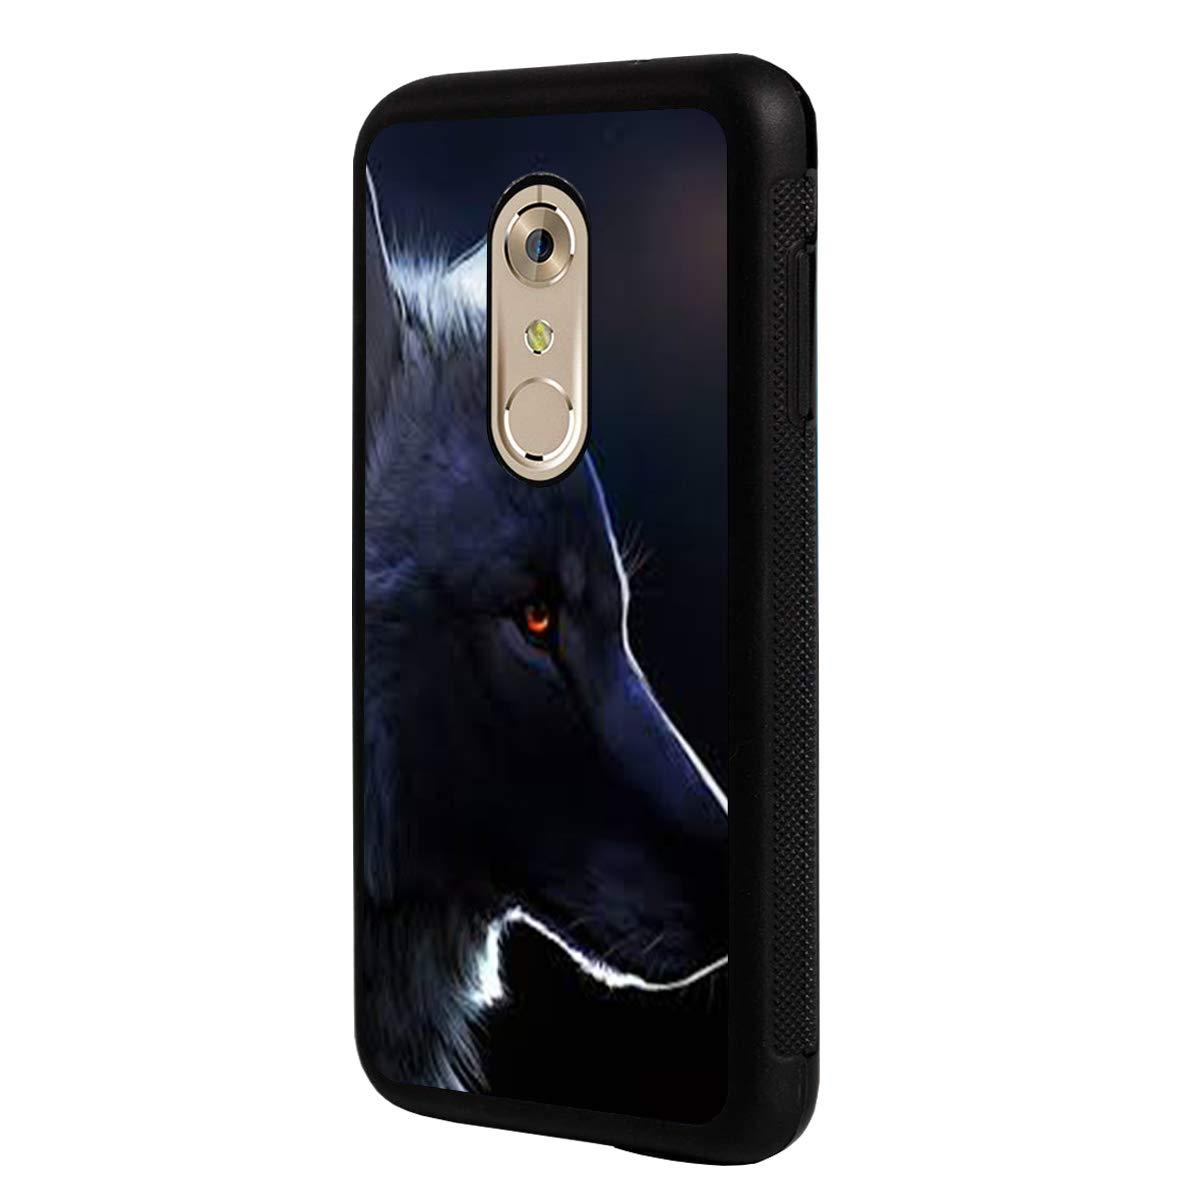 LG Q7 Case,LG Q7 Plus Case,BOSLIVE Wolf Background Design TPU Slim Anti-Scratch Protective Cover Case for LG Q7 /LG Q7 Plus